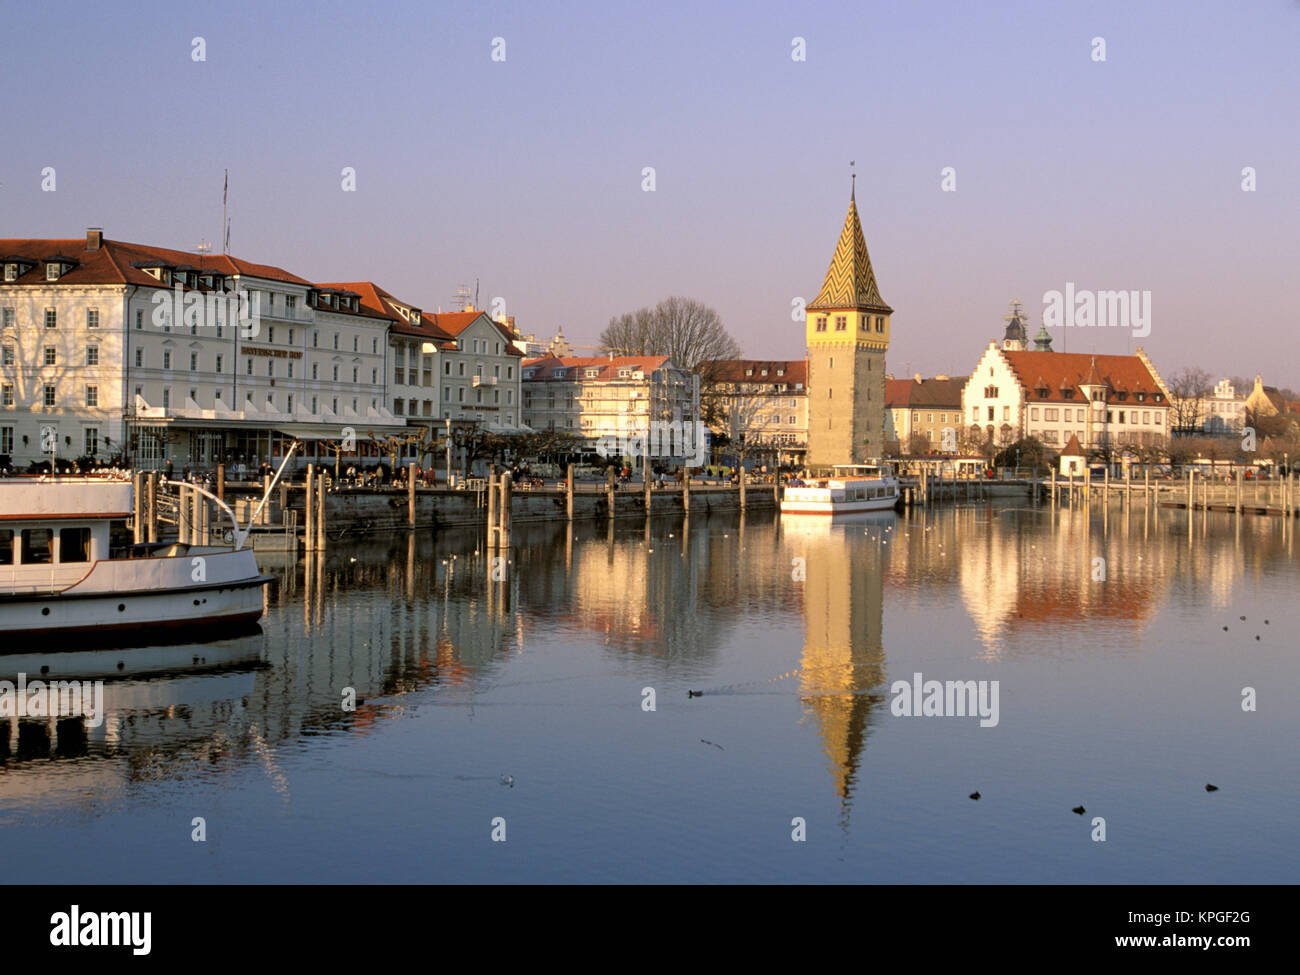 Europe Germany Bayern Bavaria Lindau Im Bodensee Harbor View